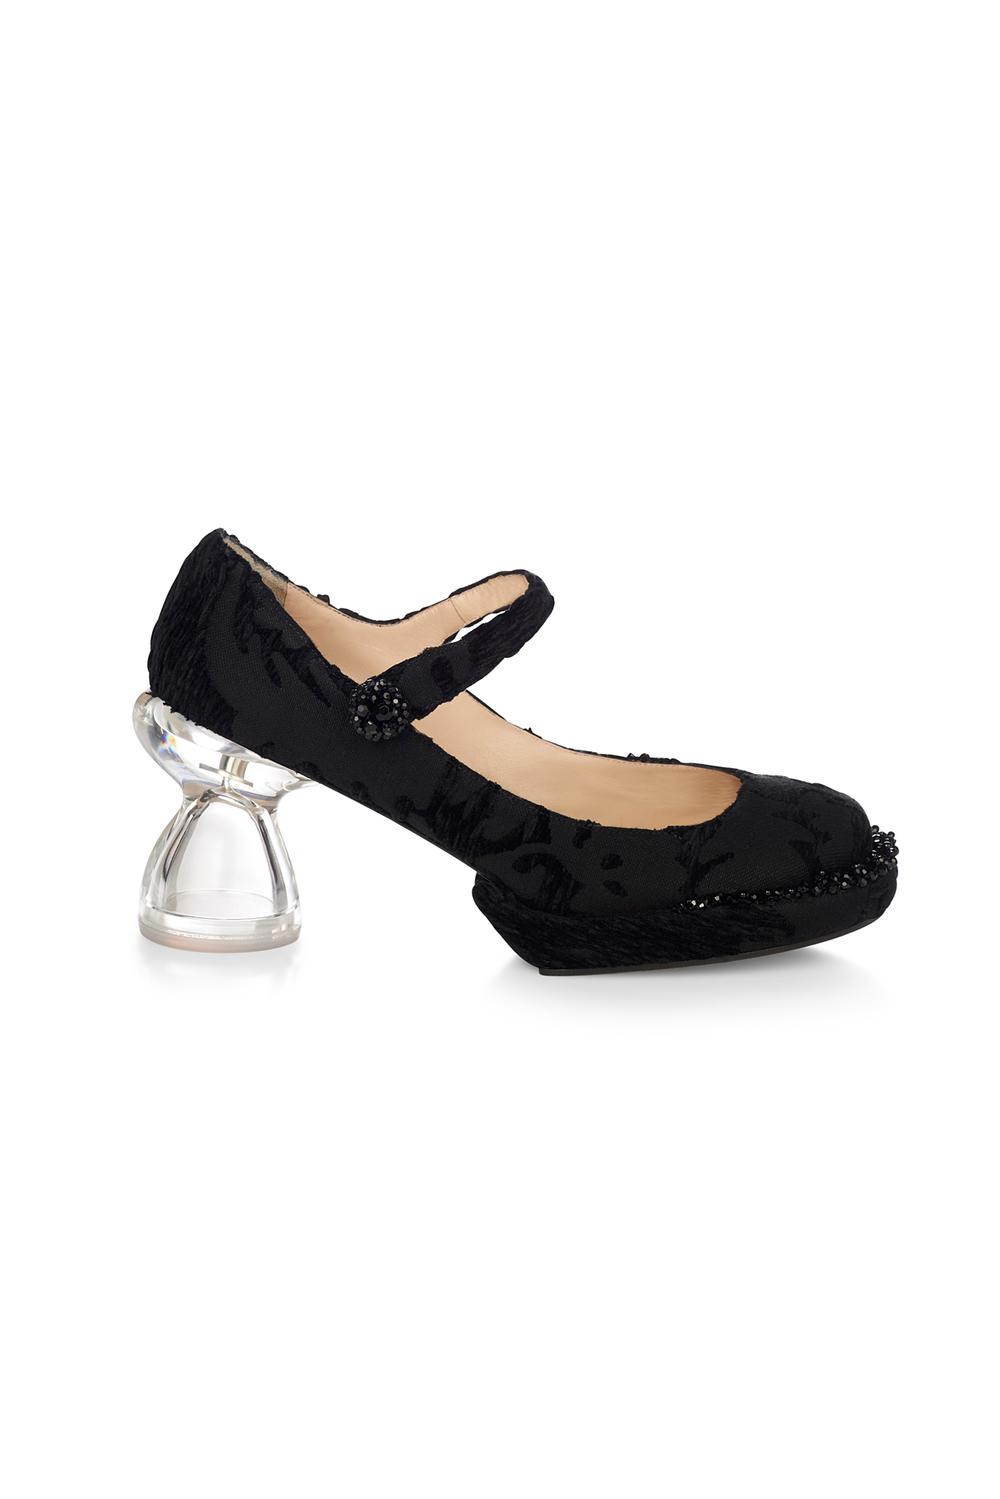 04-05-accessories-trends-fall-2015-lucite-heel.jpg